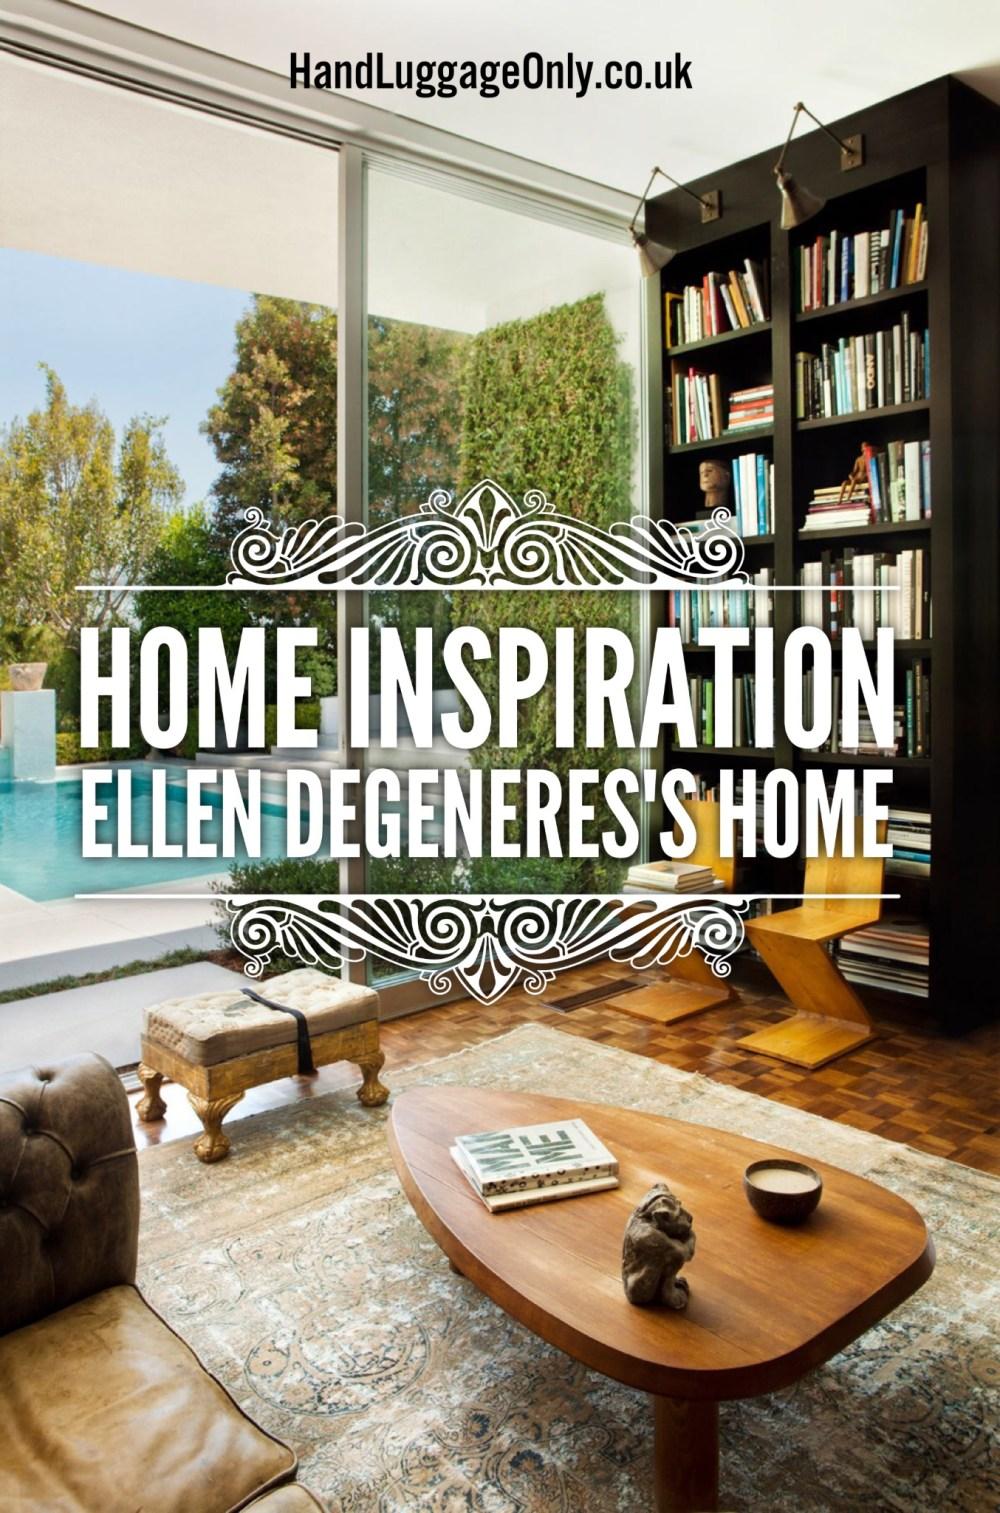 Home Inspiration: Ellen Degeneres 's Californian Home Renovation Project